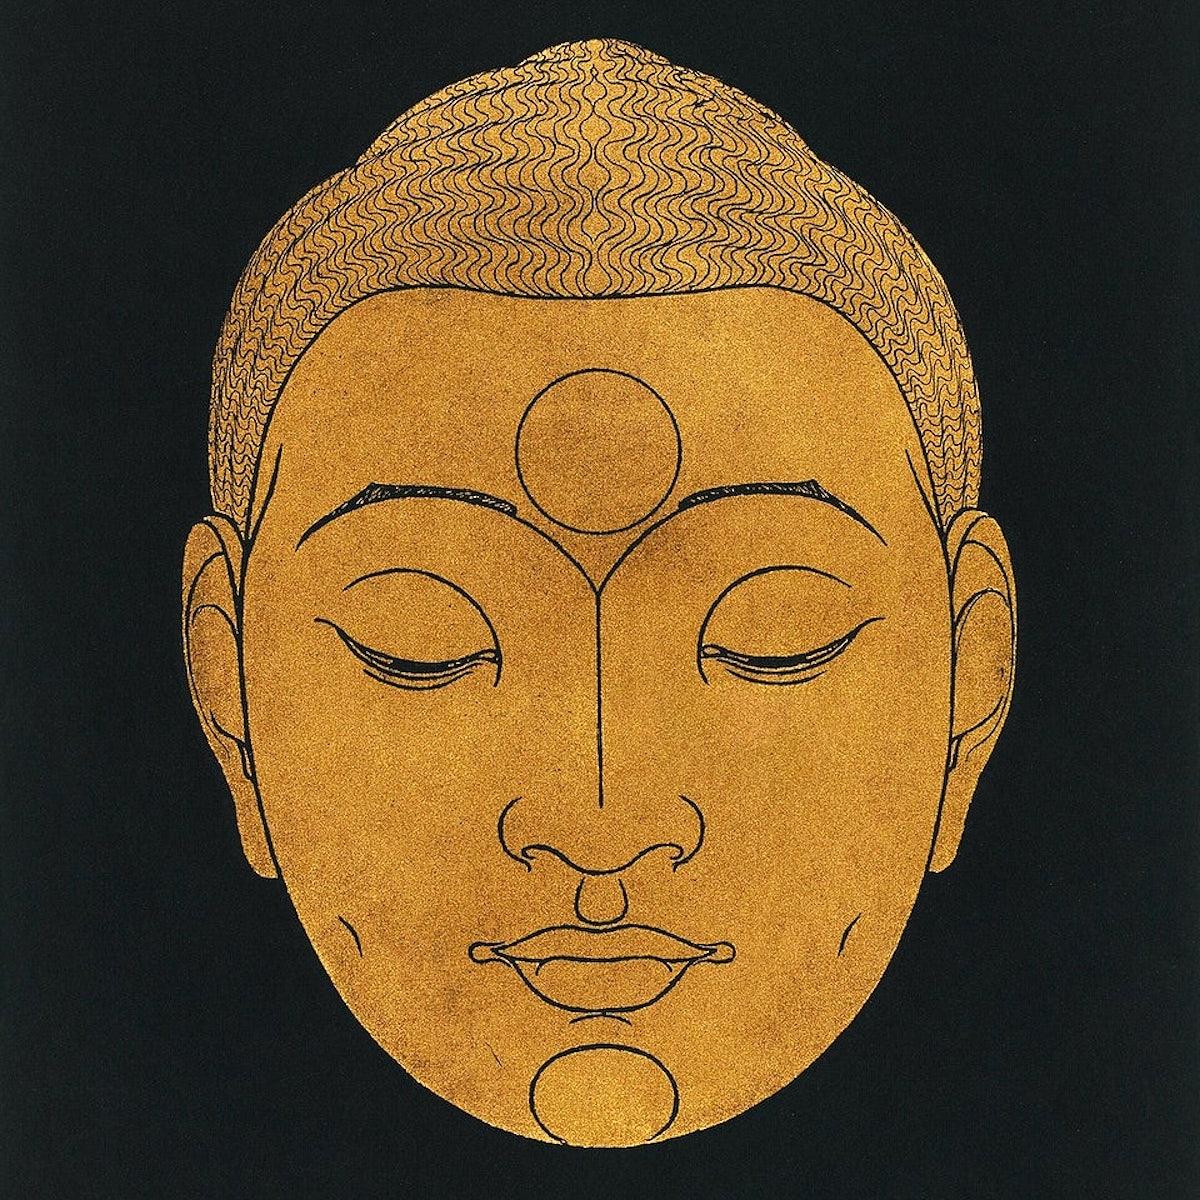 Reijer Stolk | Reijer Stolk · Woodblock Prints, Painting, and Batik CC0 Public Domain Artworks | rawpixel